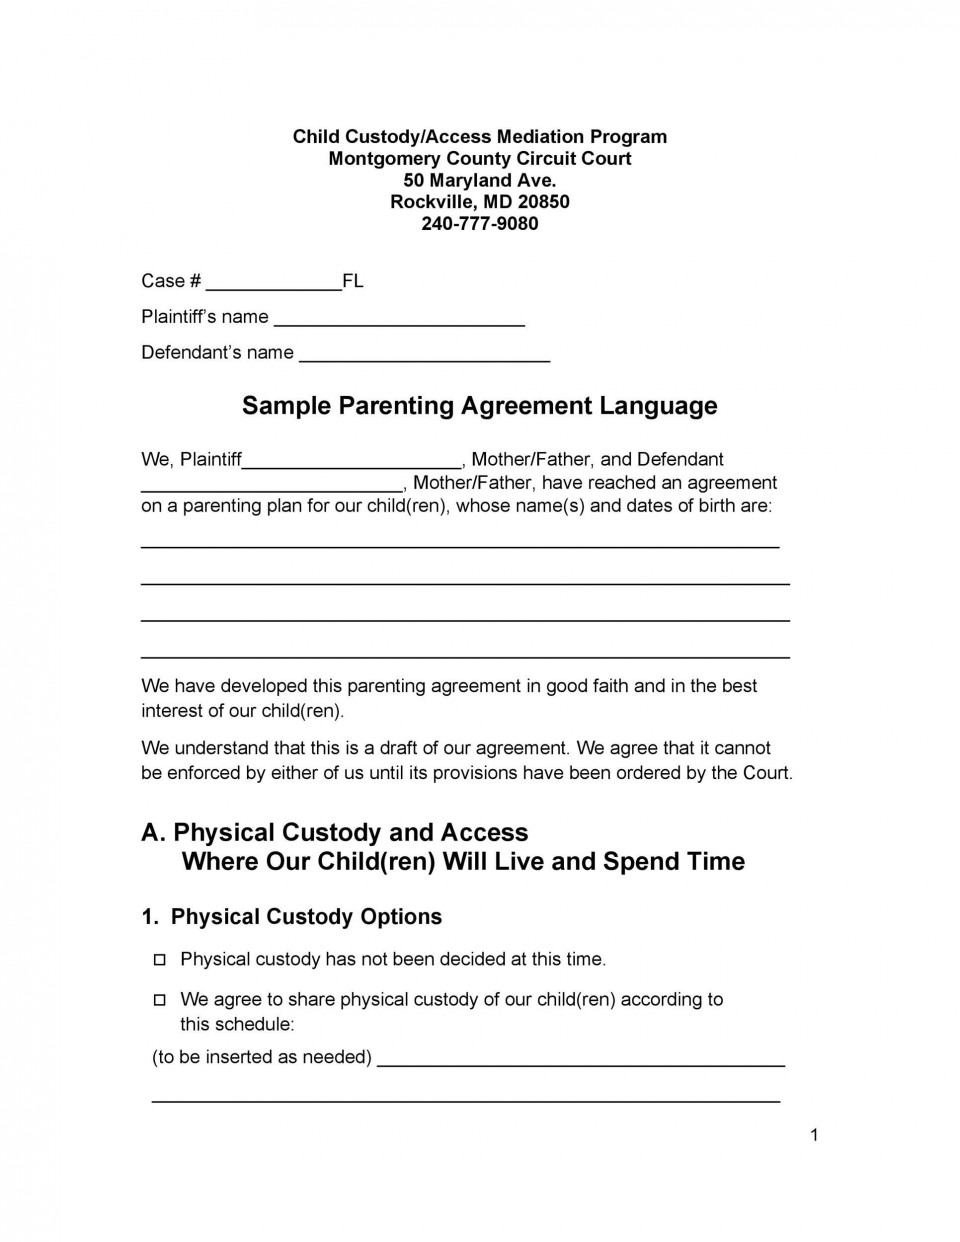 007 Top Child Custody Agreement Template High Definition  Texa Nj Uk960